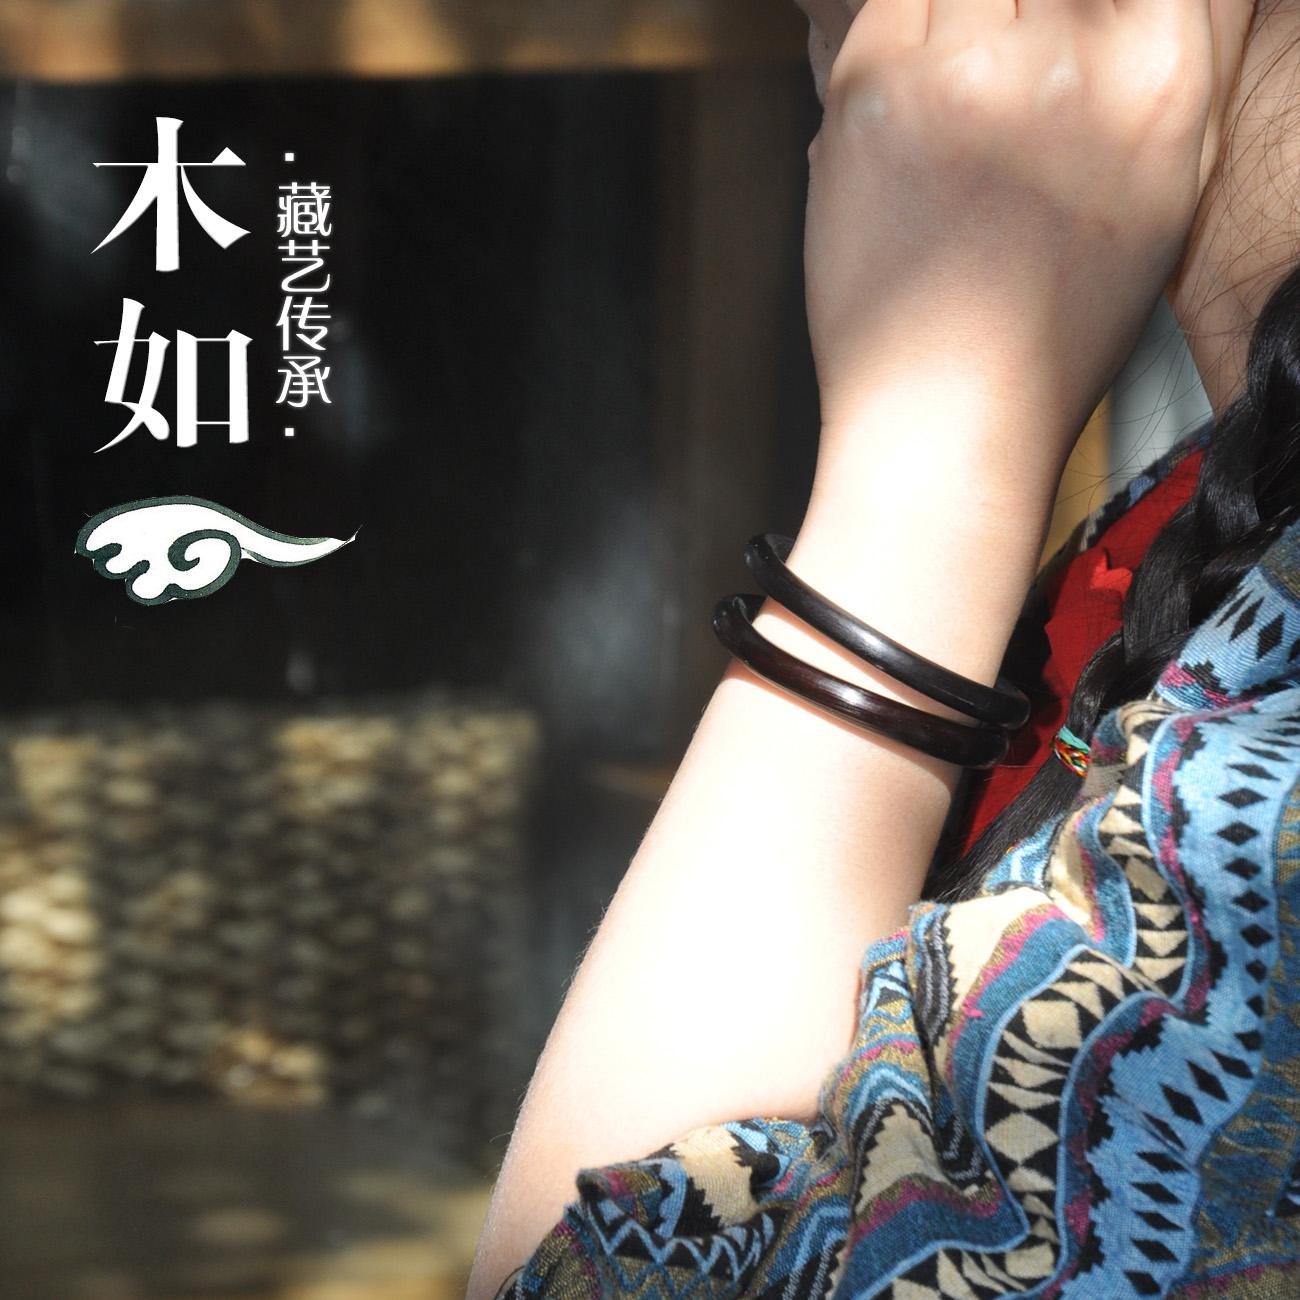 [mu Ru] Tibetan jixueteng Bracelet rattan Bracelet no medicine rattan mens and womens jewelry wooden Bracelet pure natural